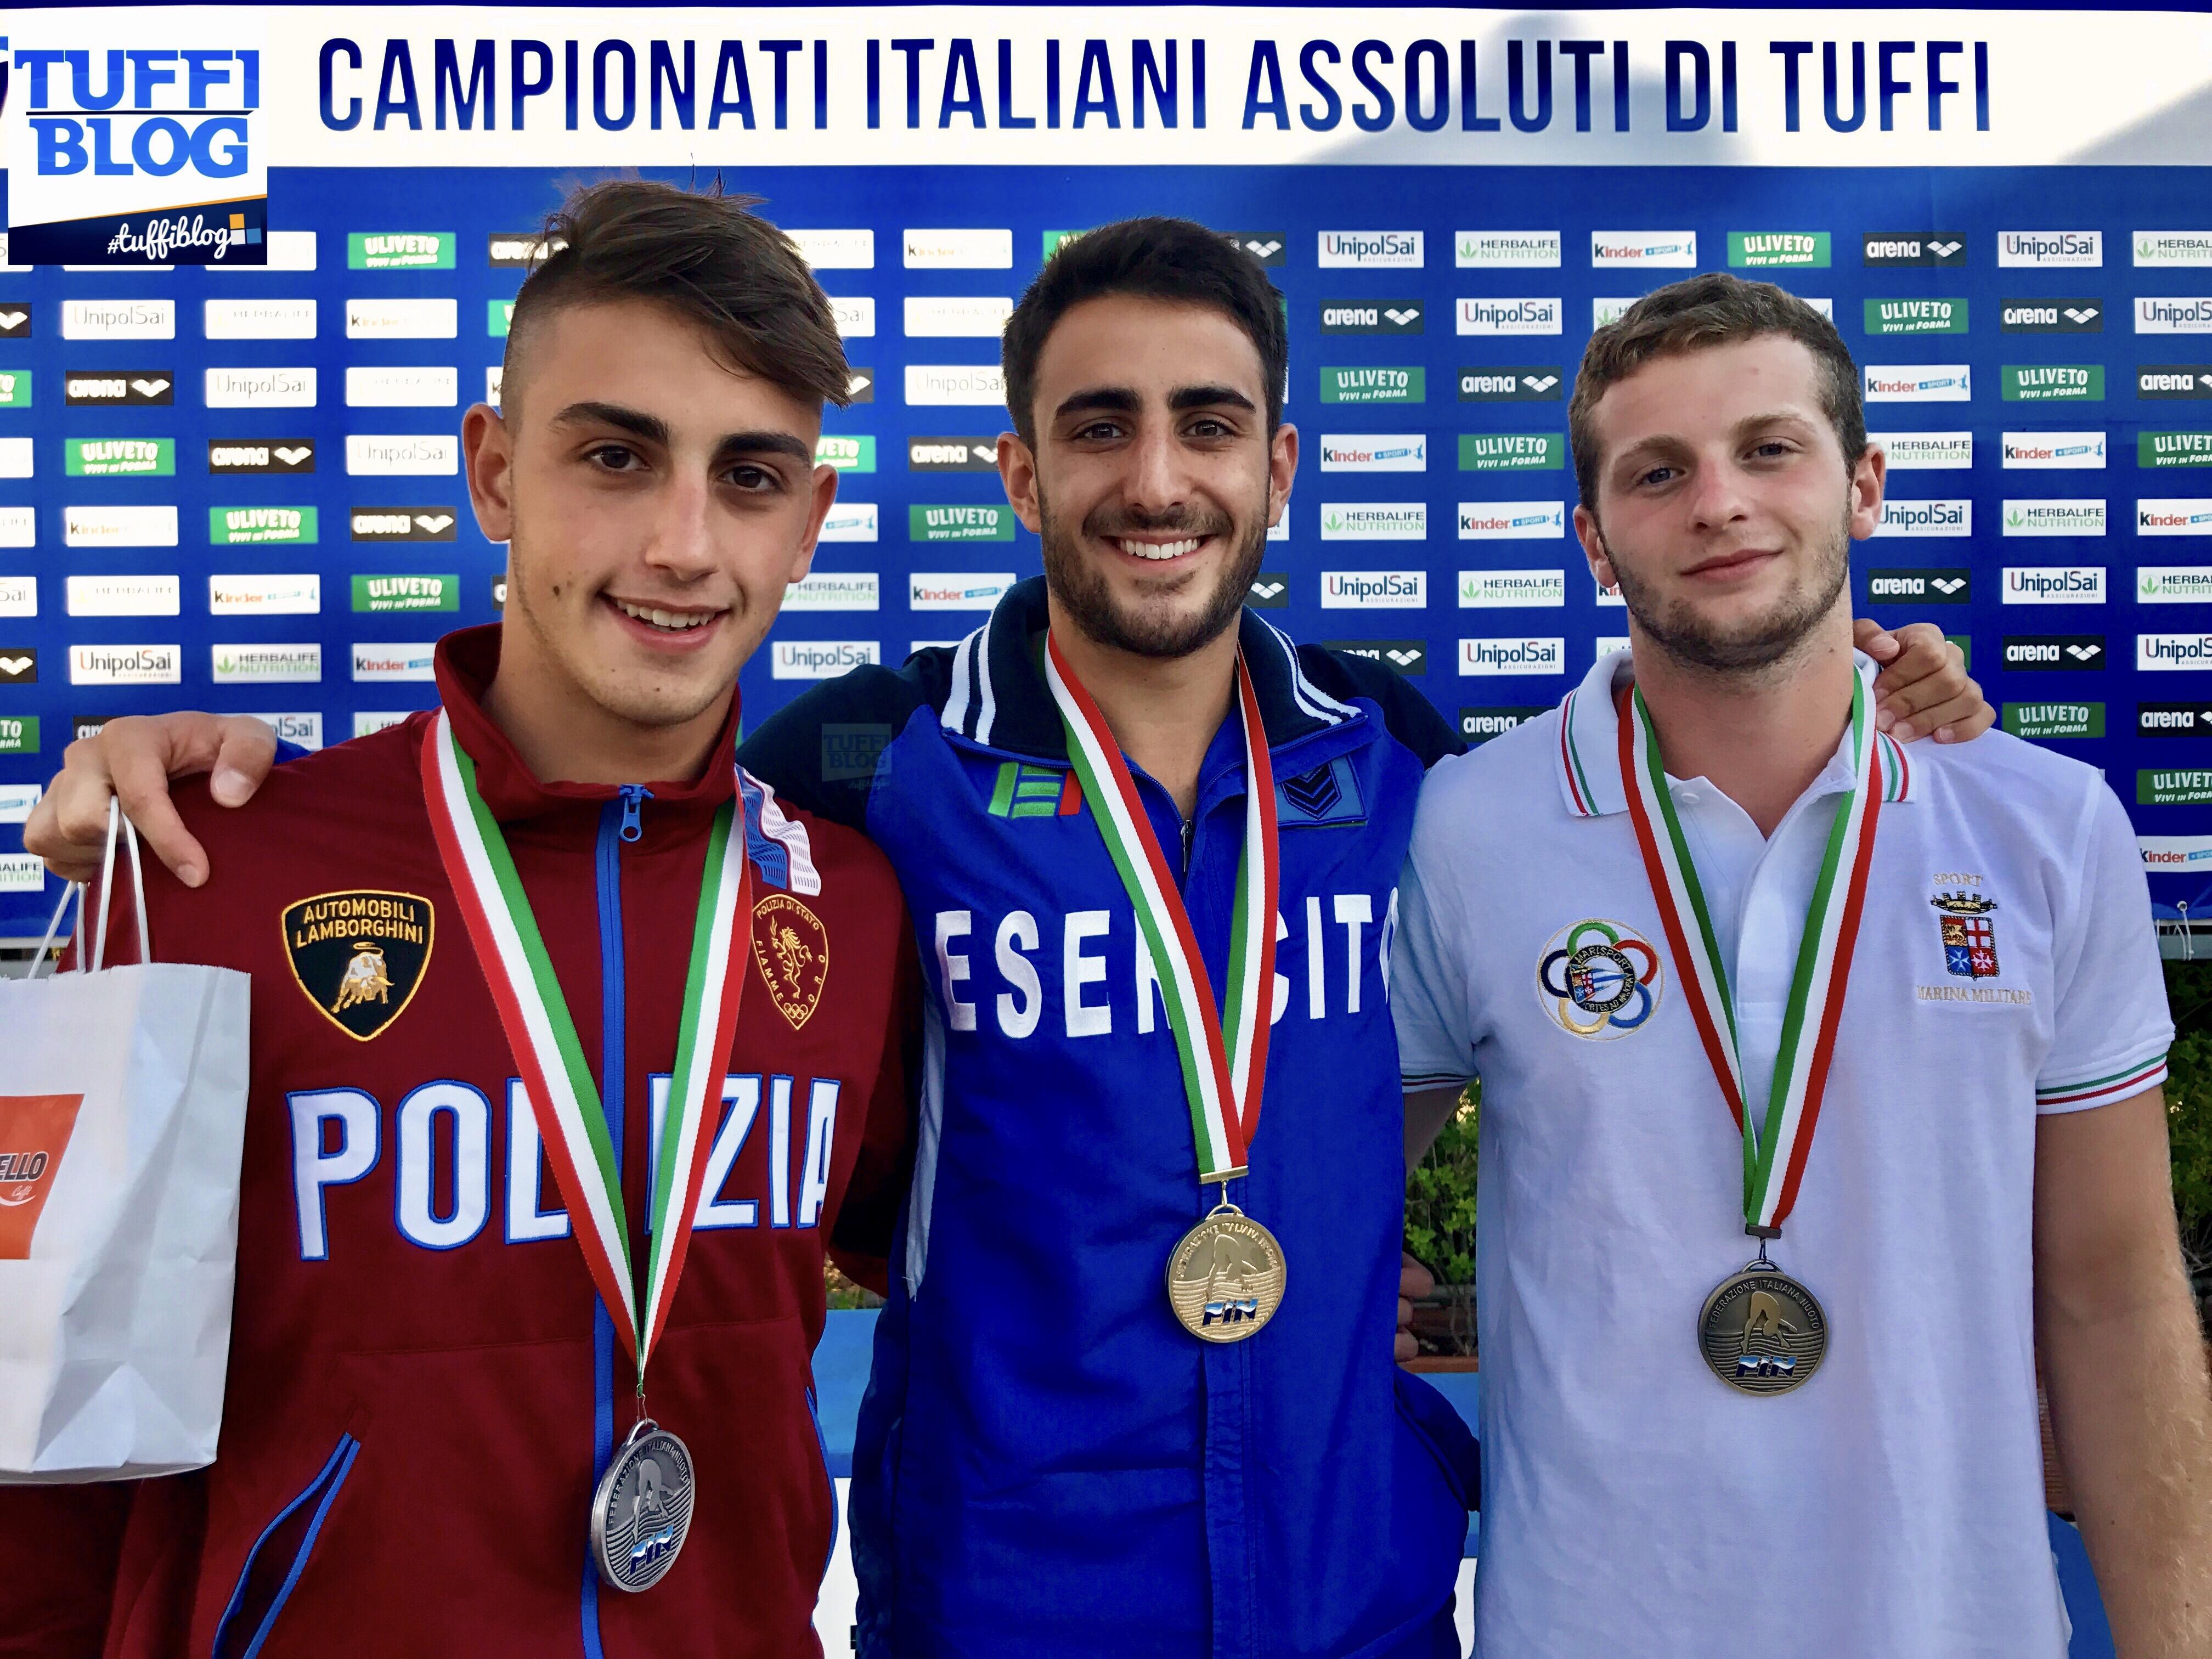 Assoluti Estivi: Cosenza - Tocci, Batki e Pellacani/Vittorioso: vittoria!